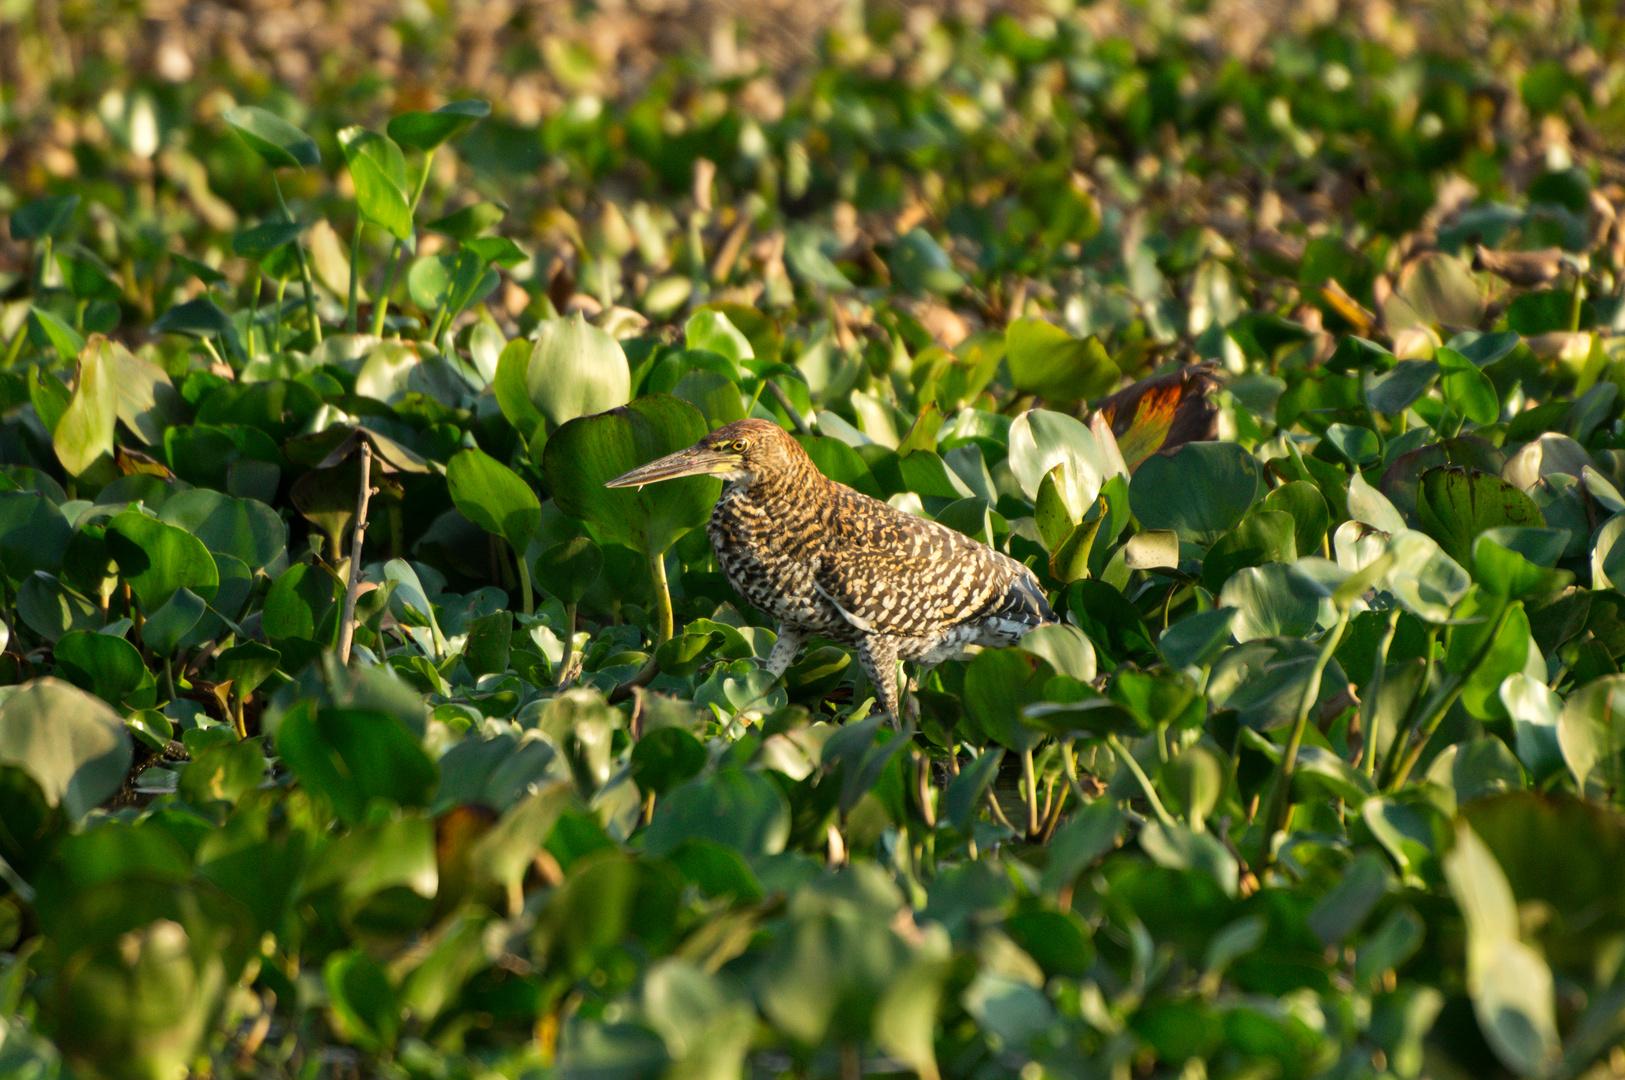 juv. Marmorreiher Pantanal